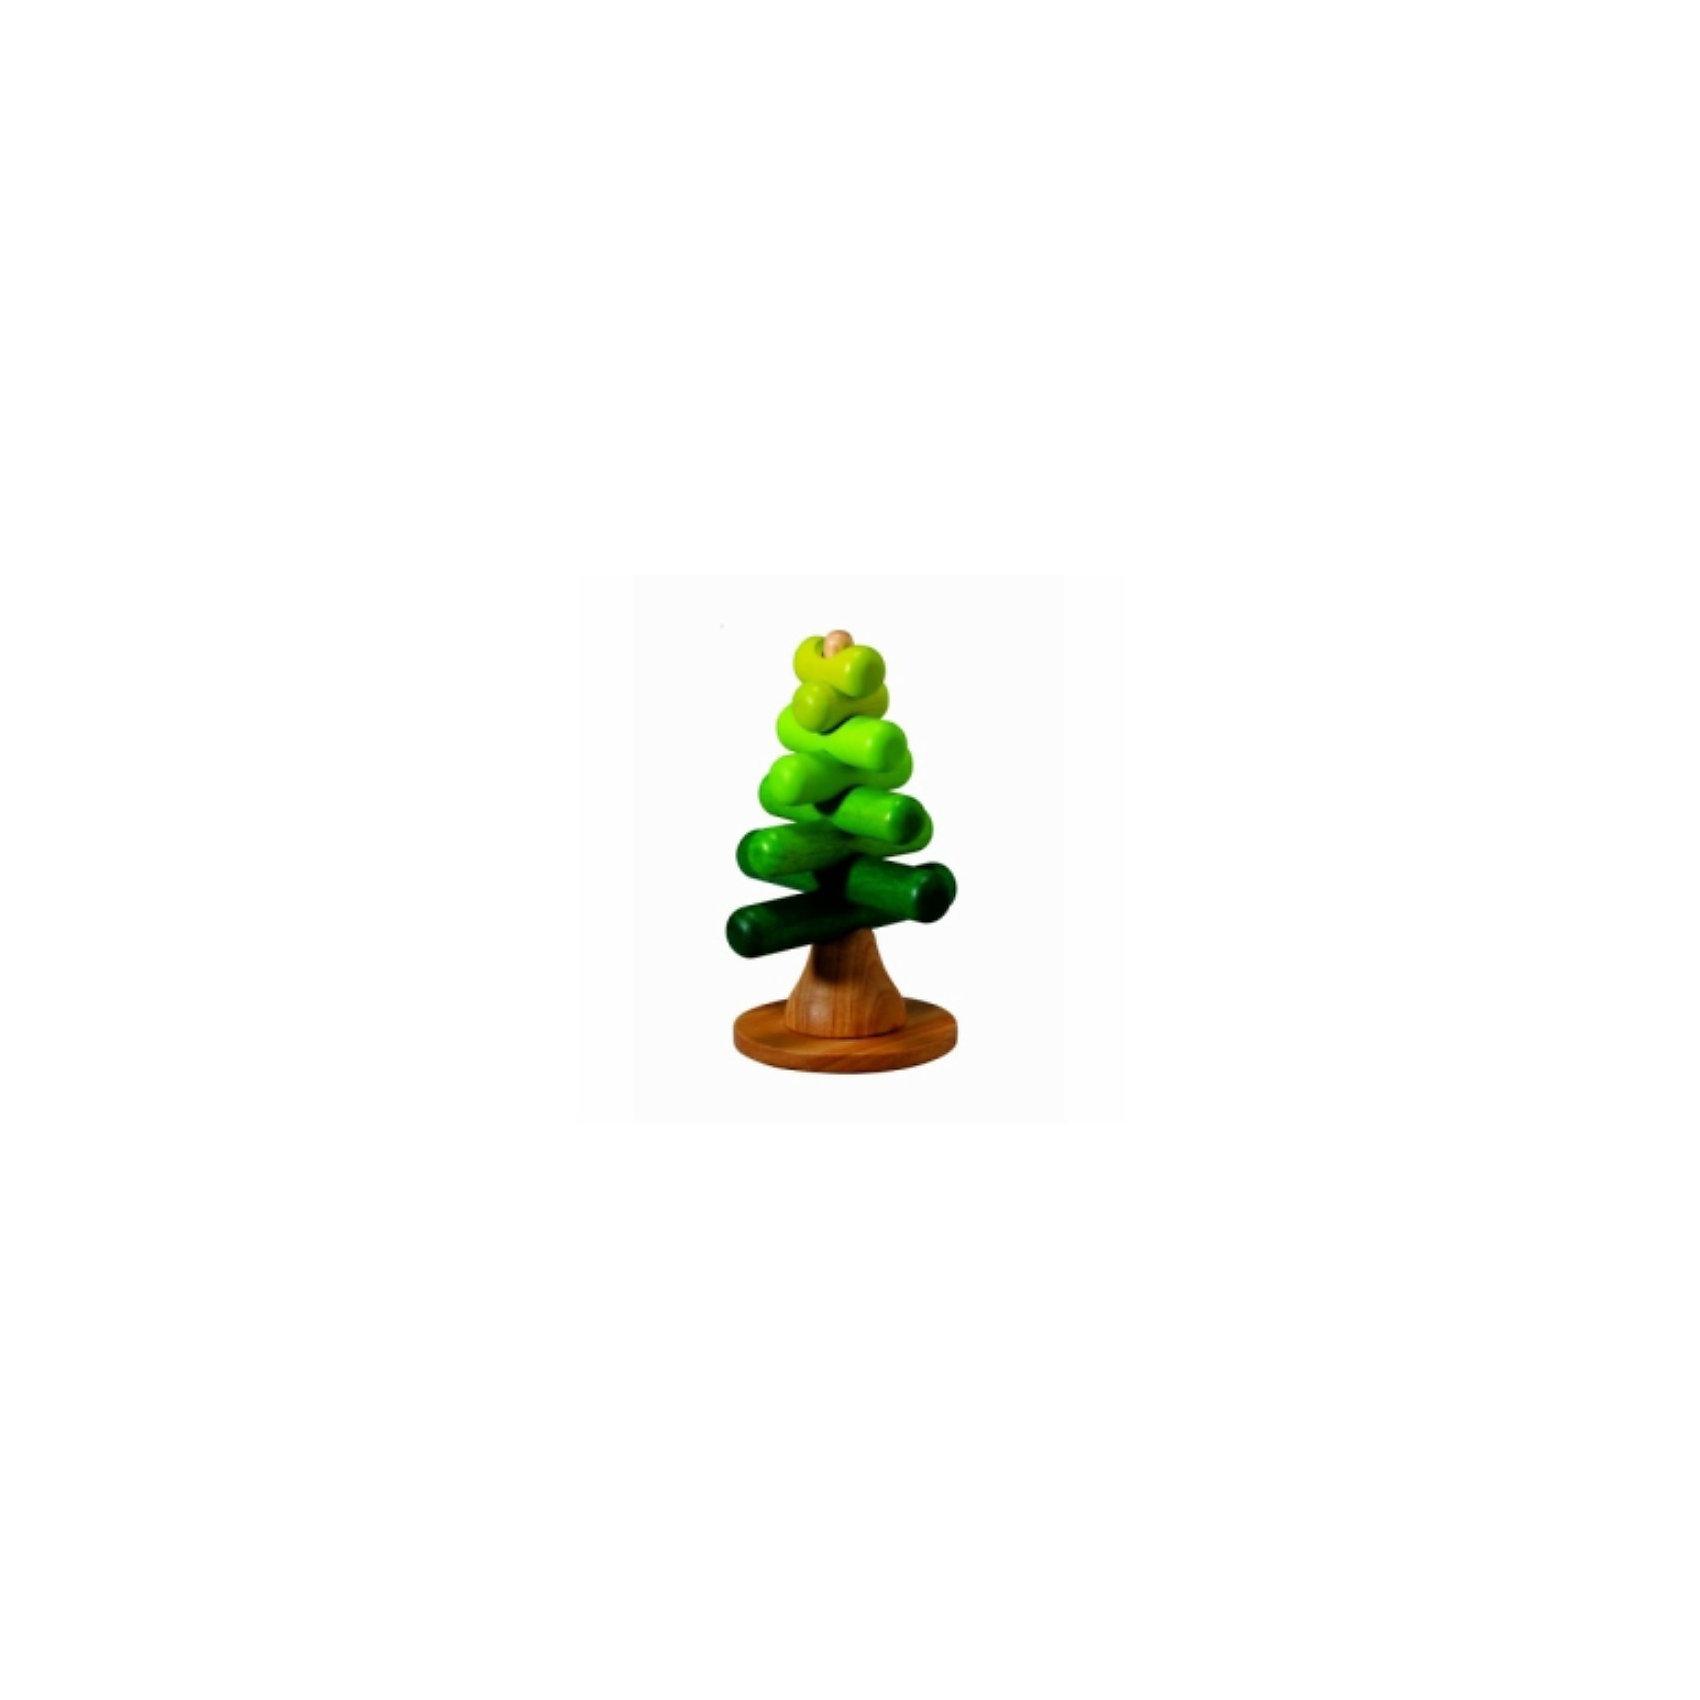 Plan Toys PLAN TOYS 5149 Дерево конструкторы plan toys игра кактус